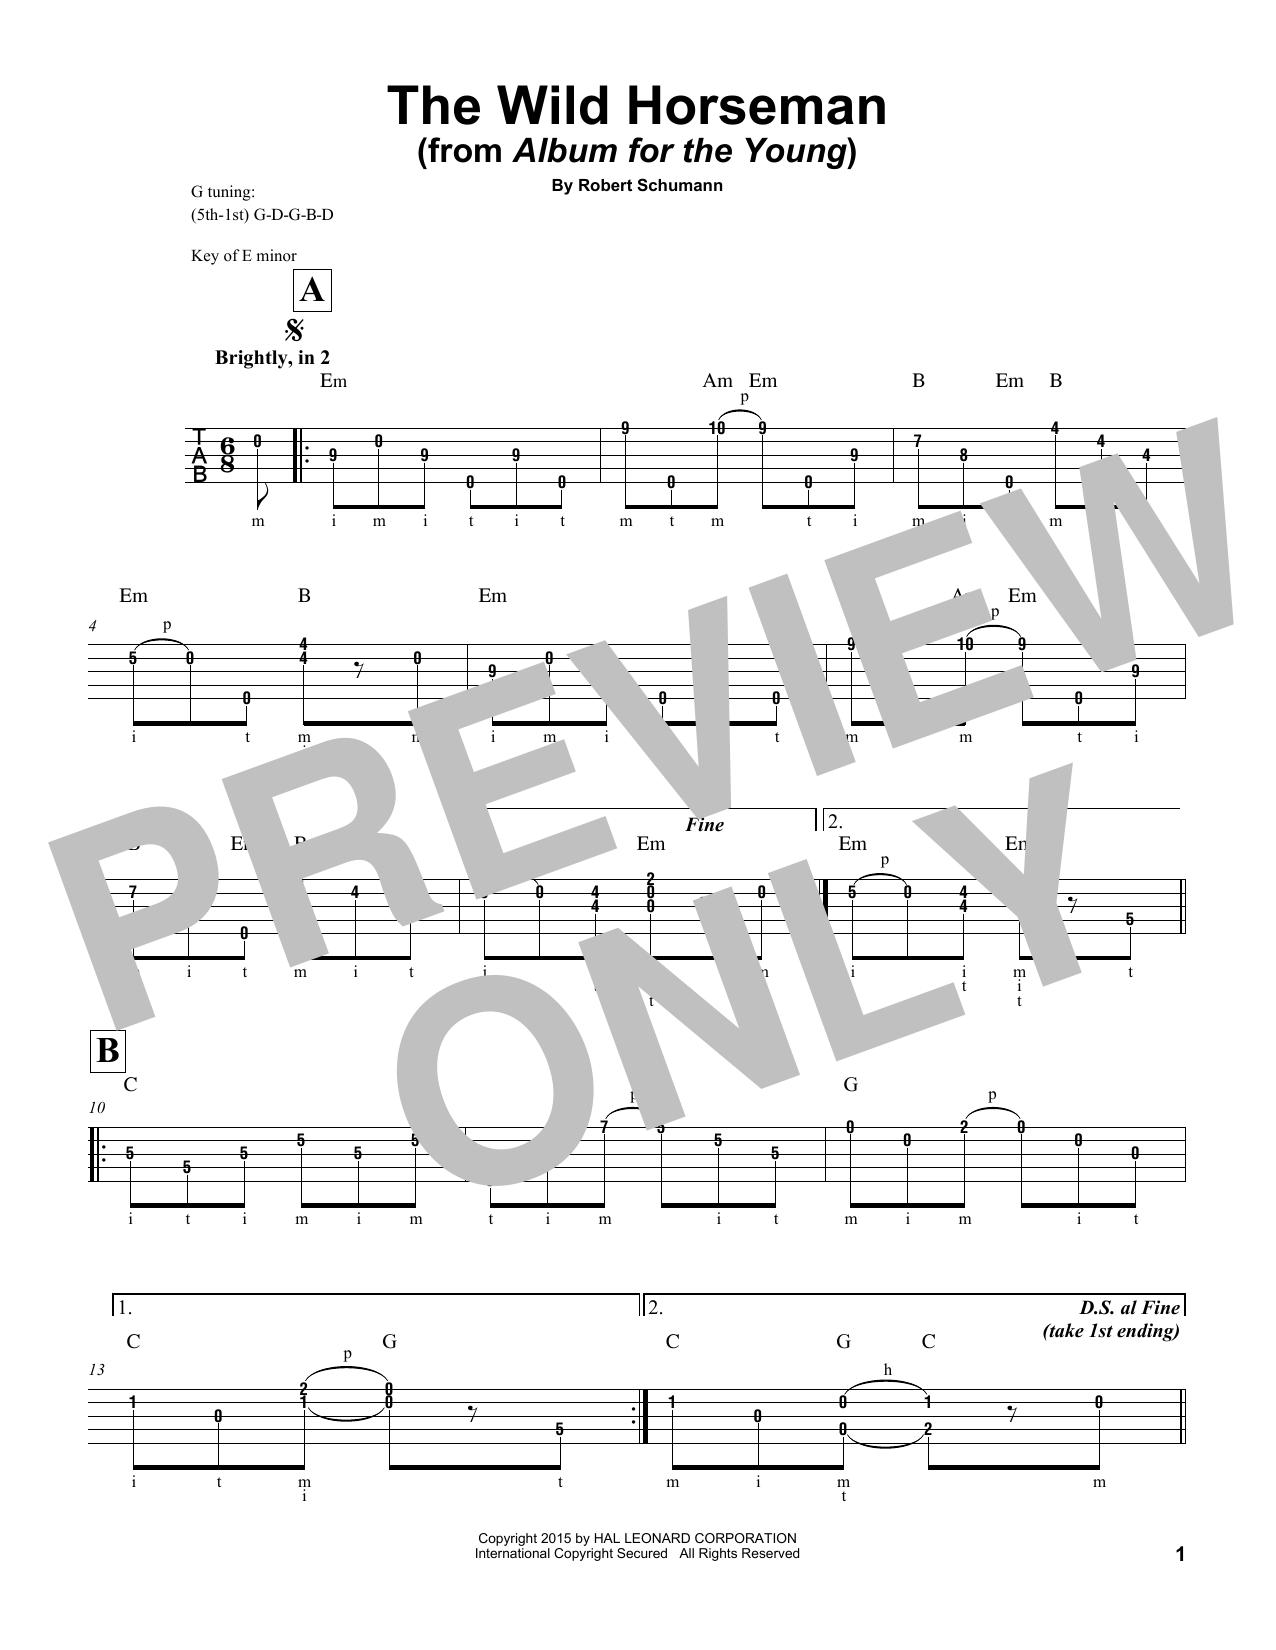 The Wild Horseman, Op. 68, No. 8 Partition Digitale